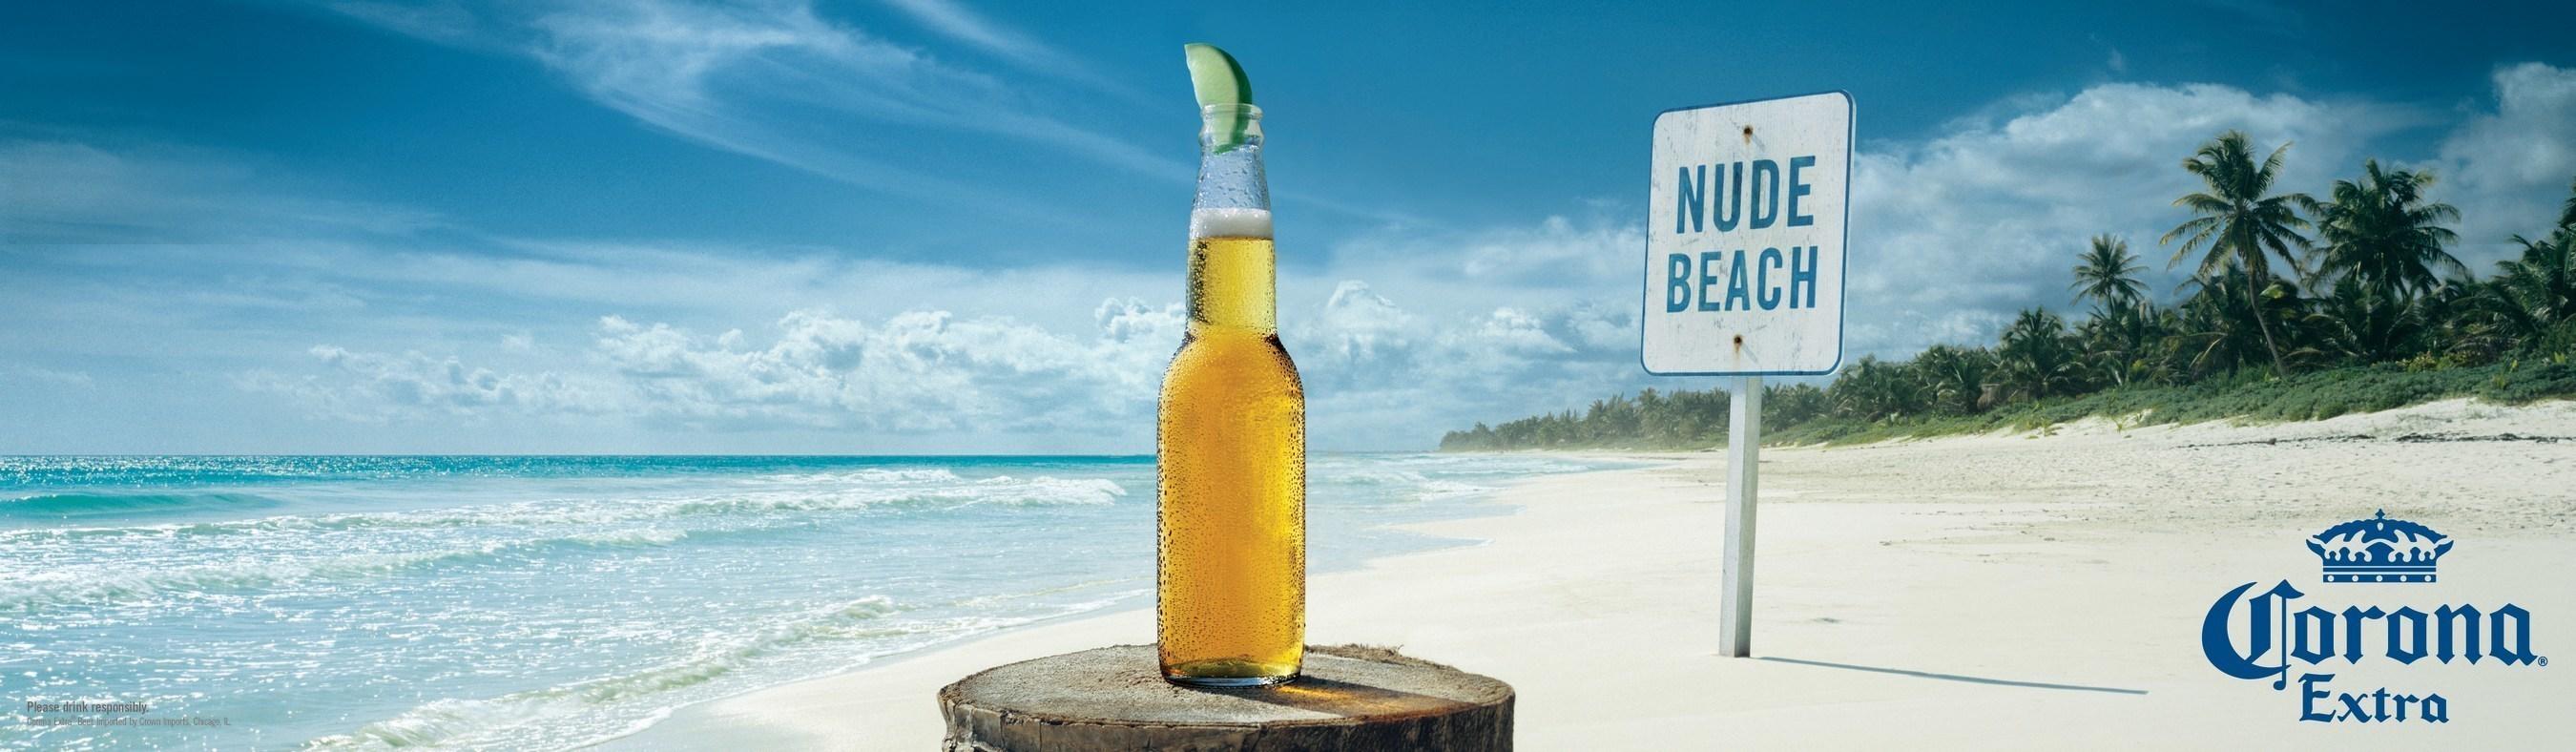 Award winning Corona Extra billboard.